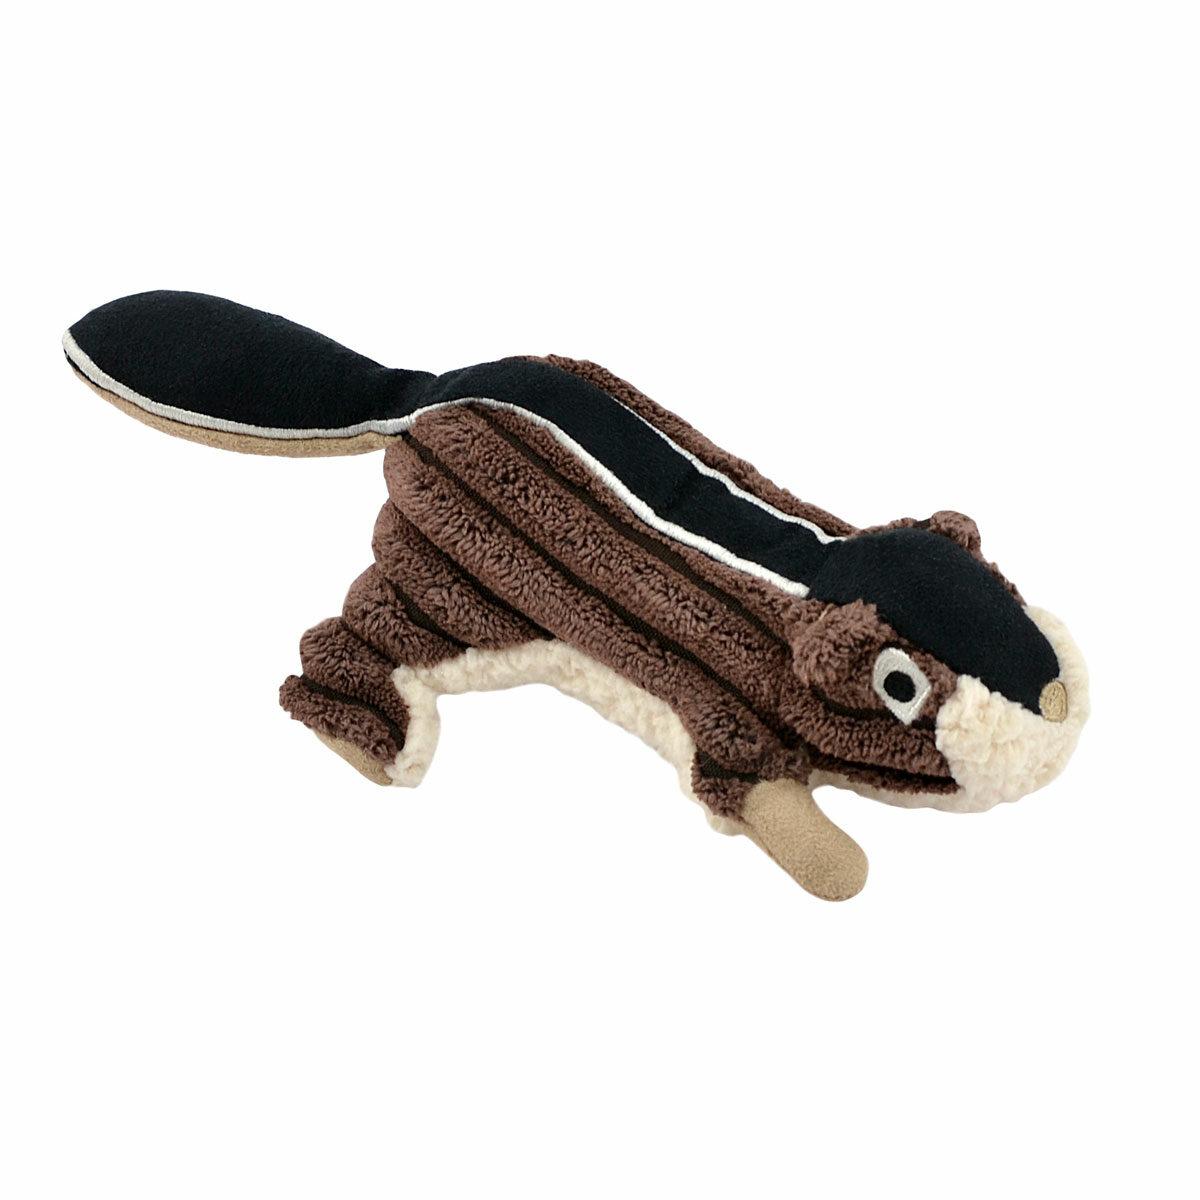 Tall Tails Plush Chipmunk Dog Toy